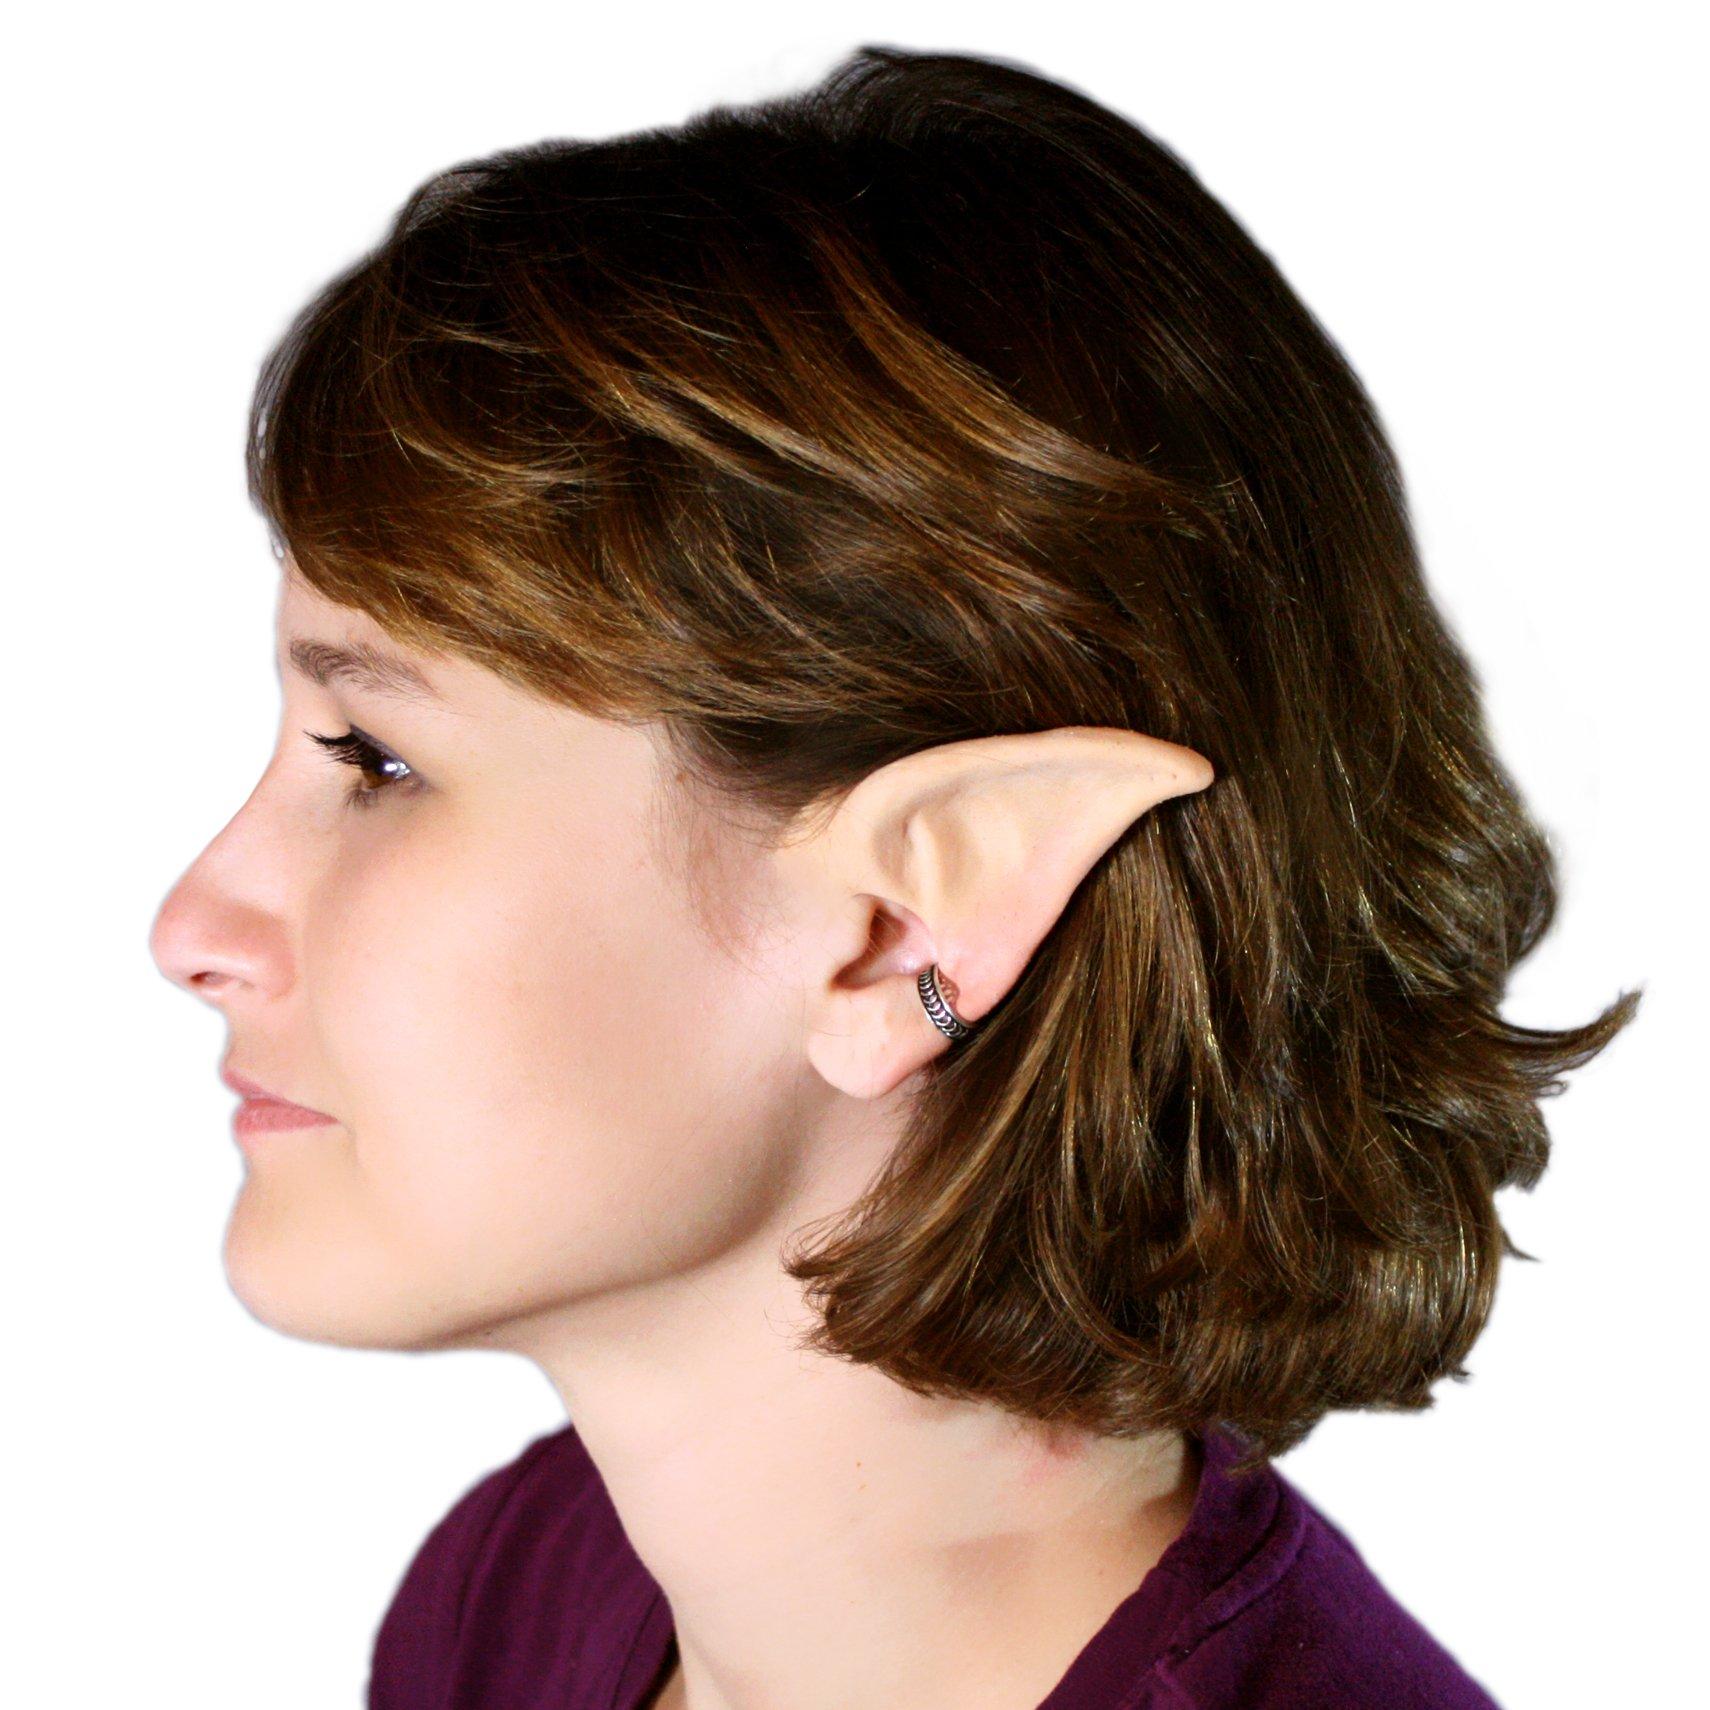 Aradani Costumes Moon Elf Ears - Ear Tips